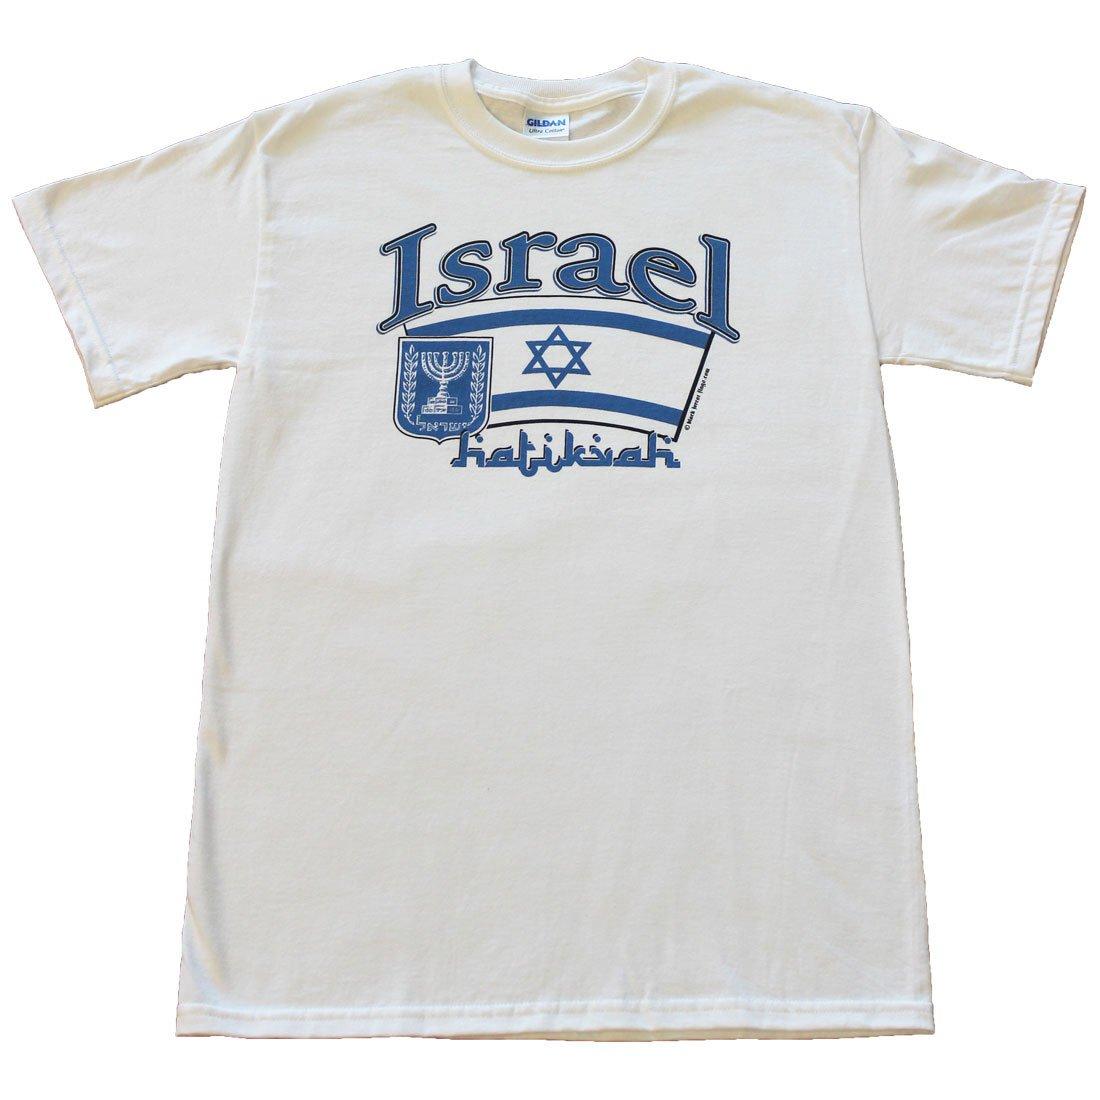 Israel International T-Shirt (S)